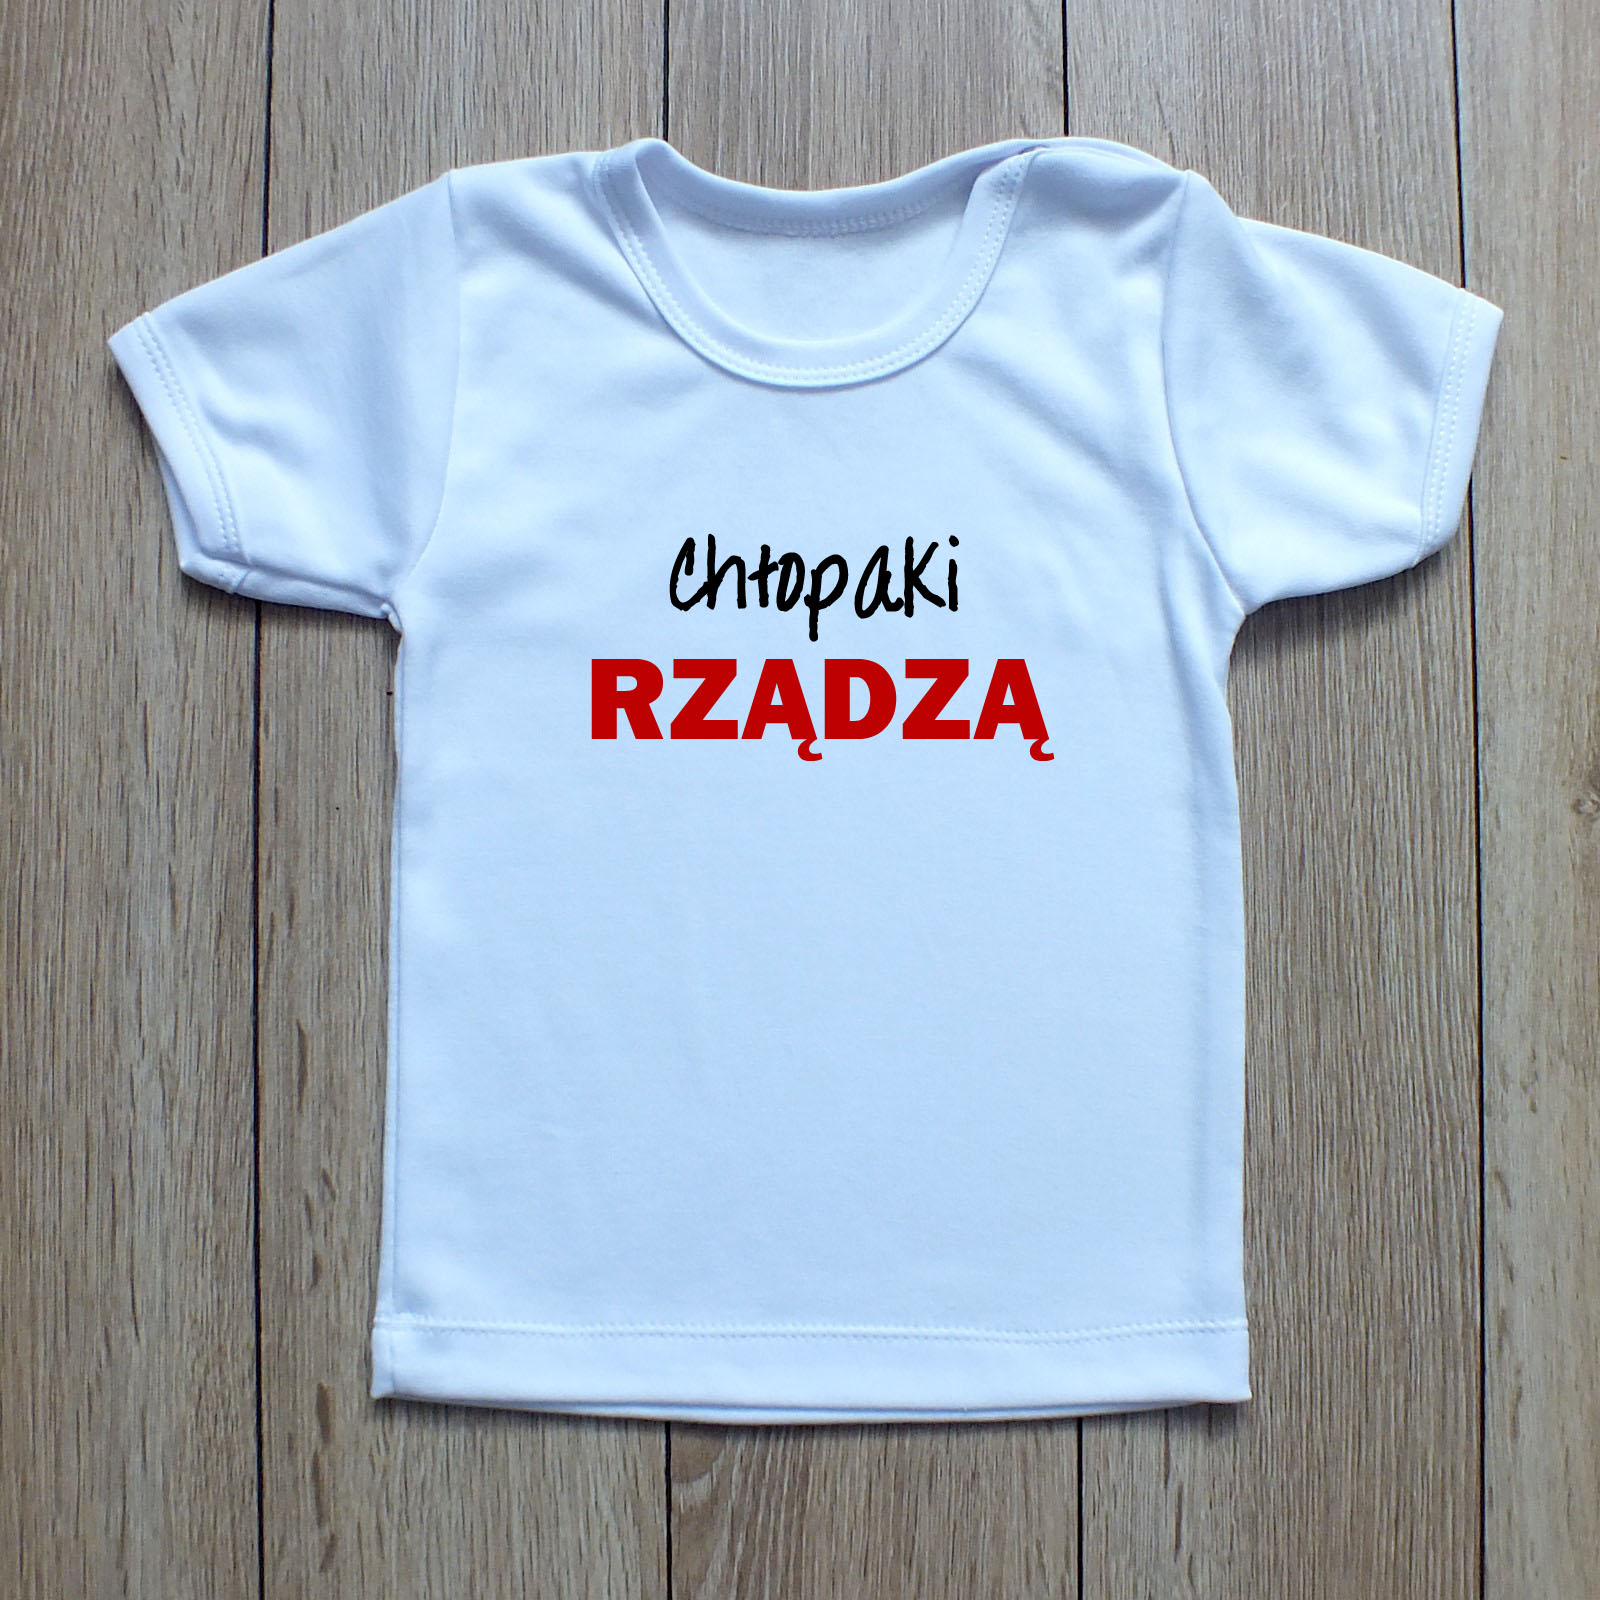 Chłopaki rządzą koszulka